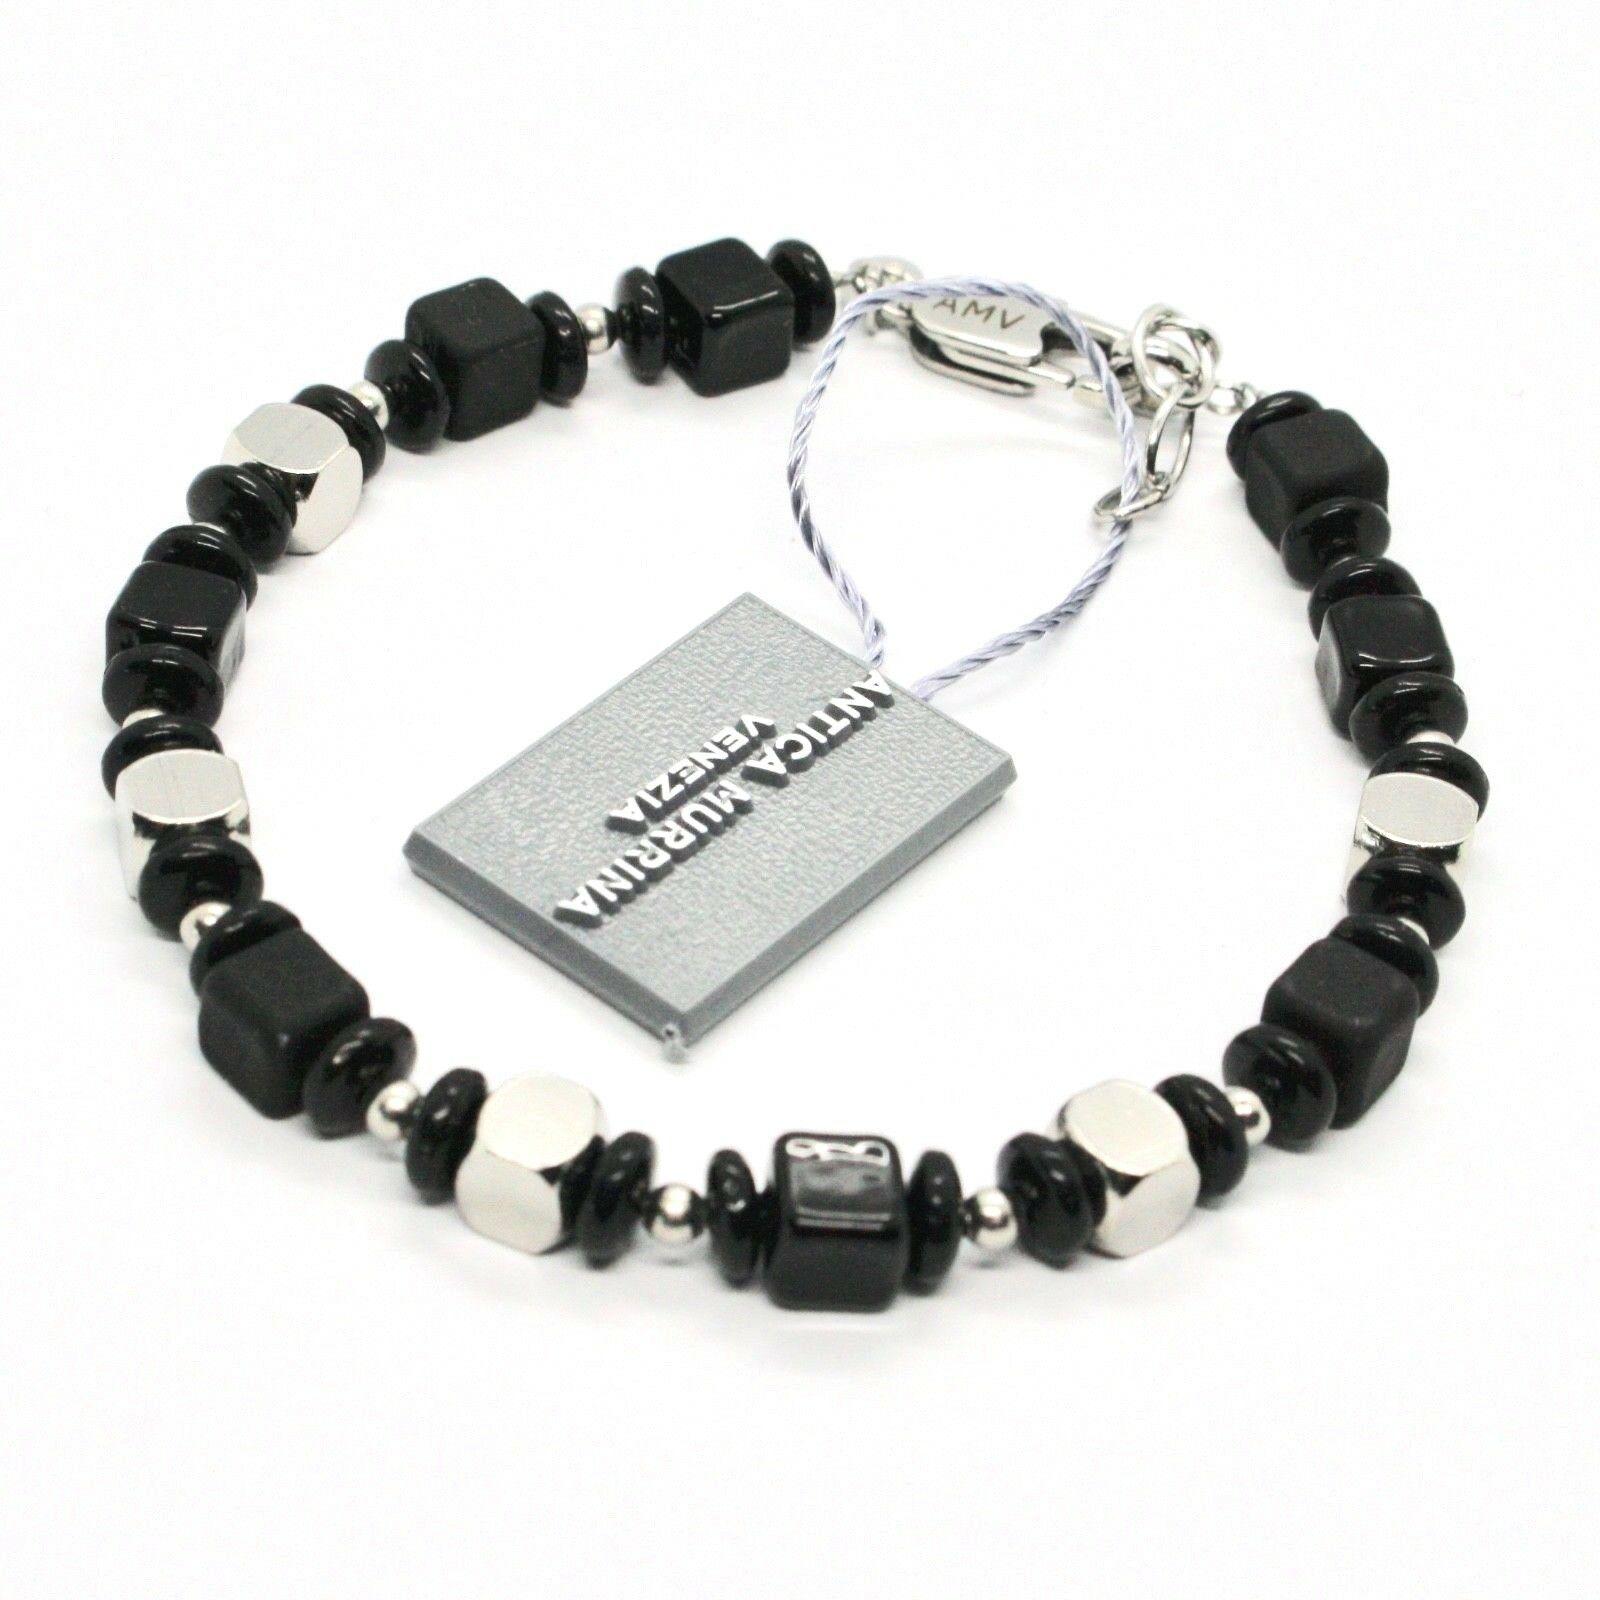 Bracelet Antica Murrina Venezia Man with Murano Glass Black Br806a14